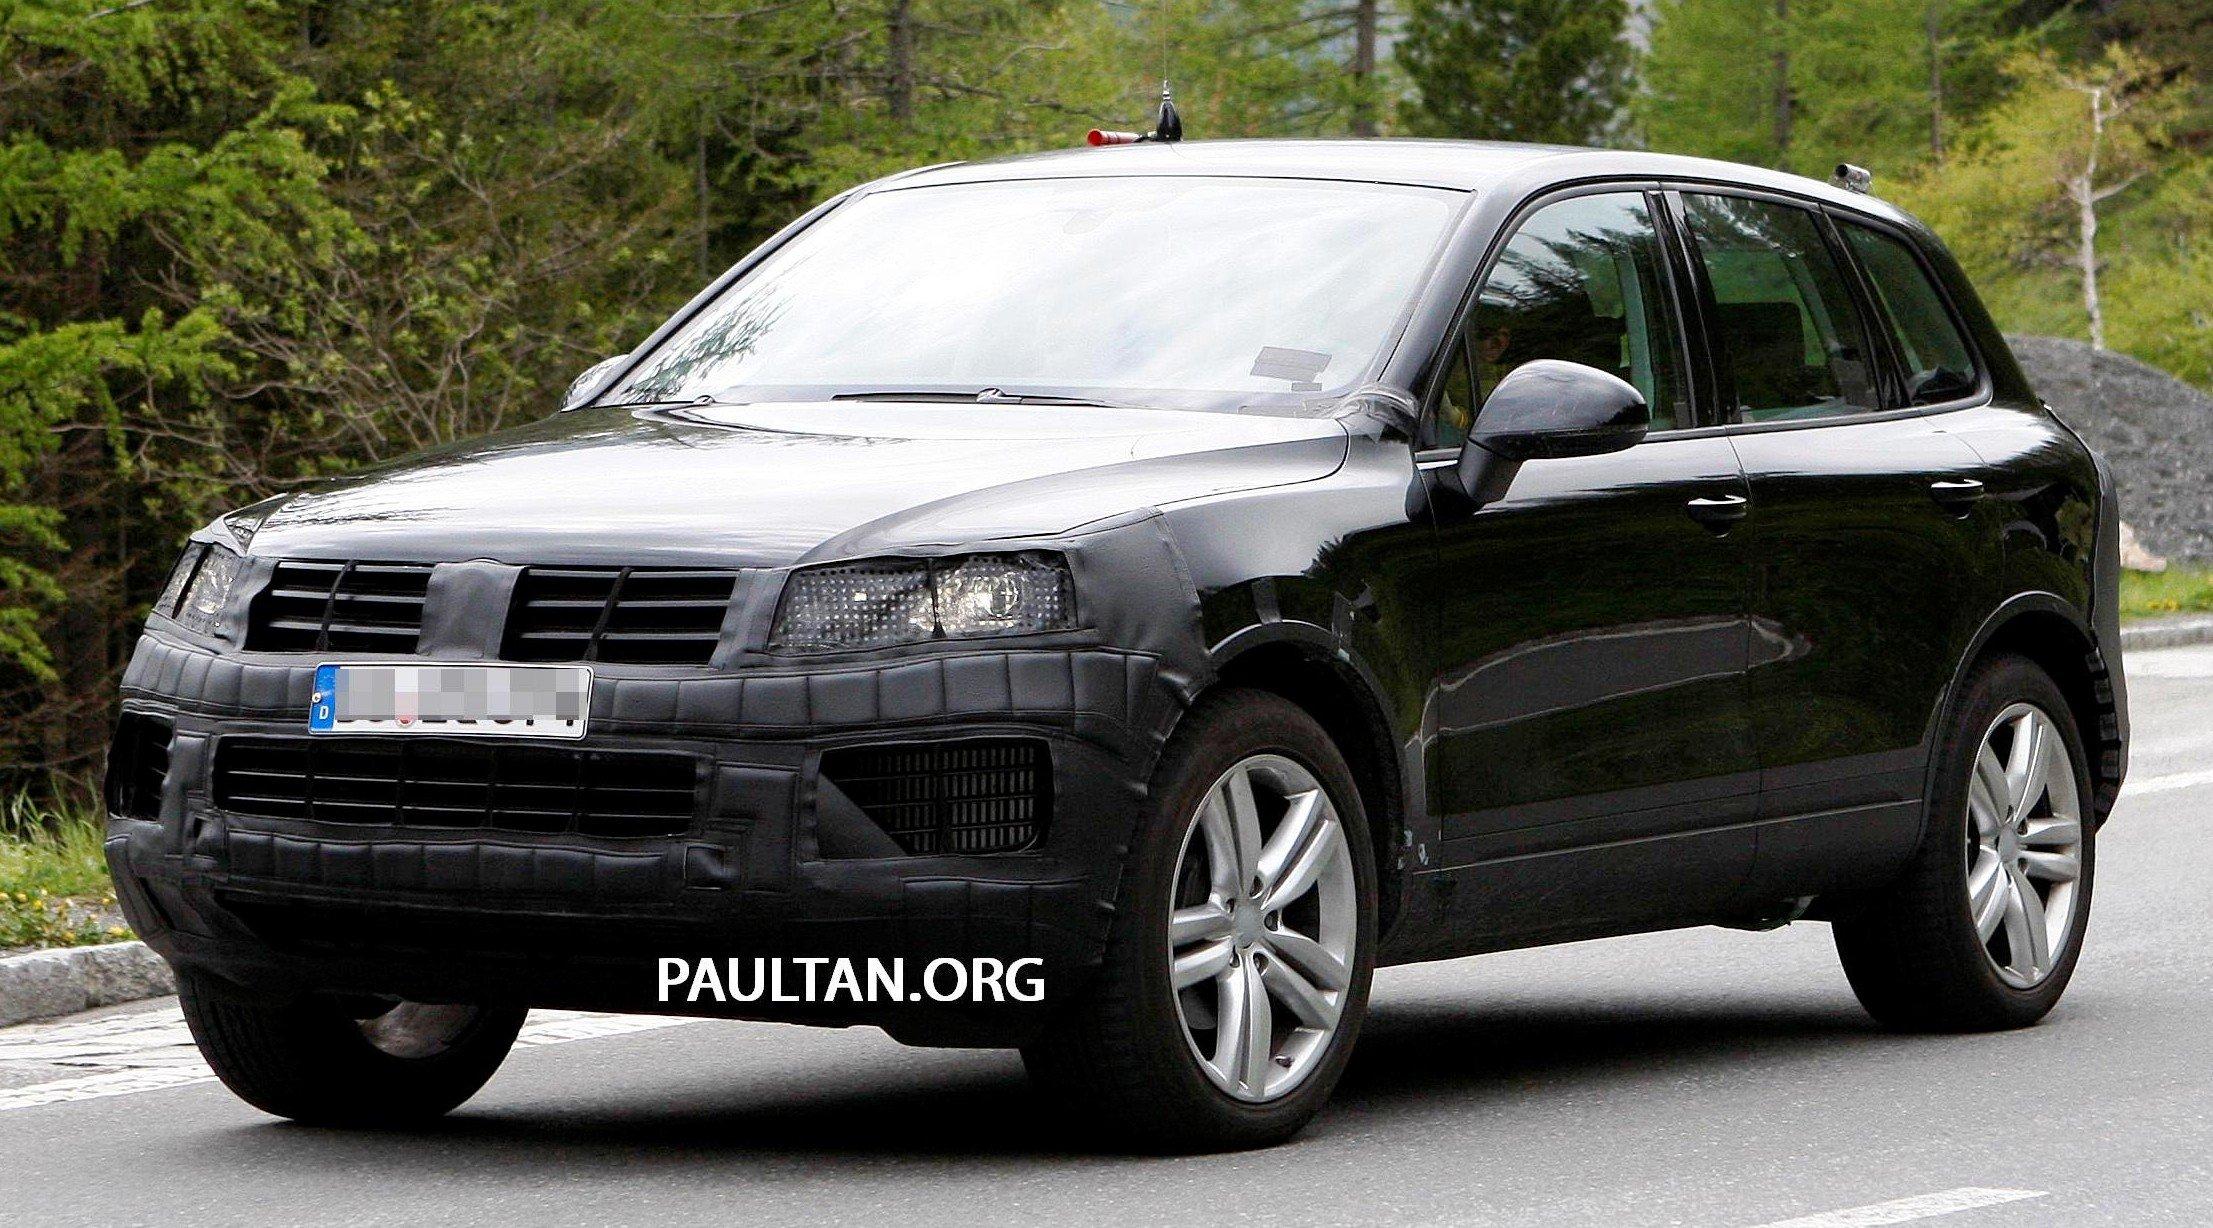 Volkswagen Touareg 2018 >> SPYSHOTS: Volkswagen Touareg facelift; due 2014 Image 179829